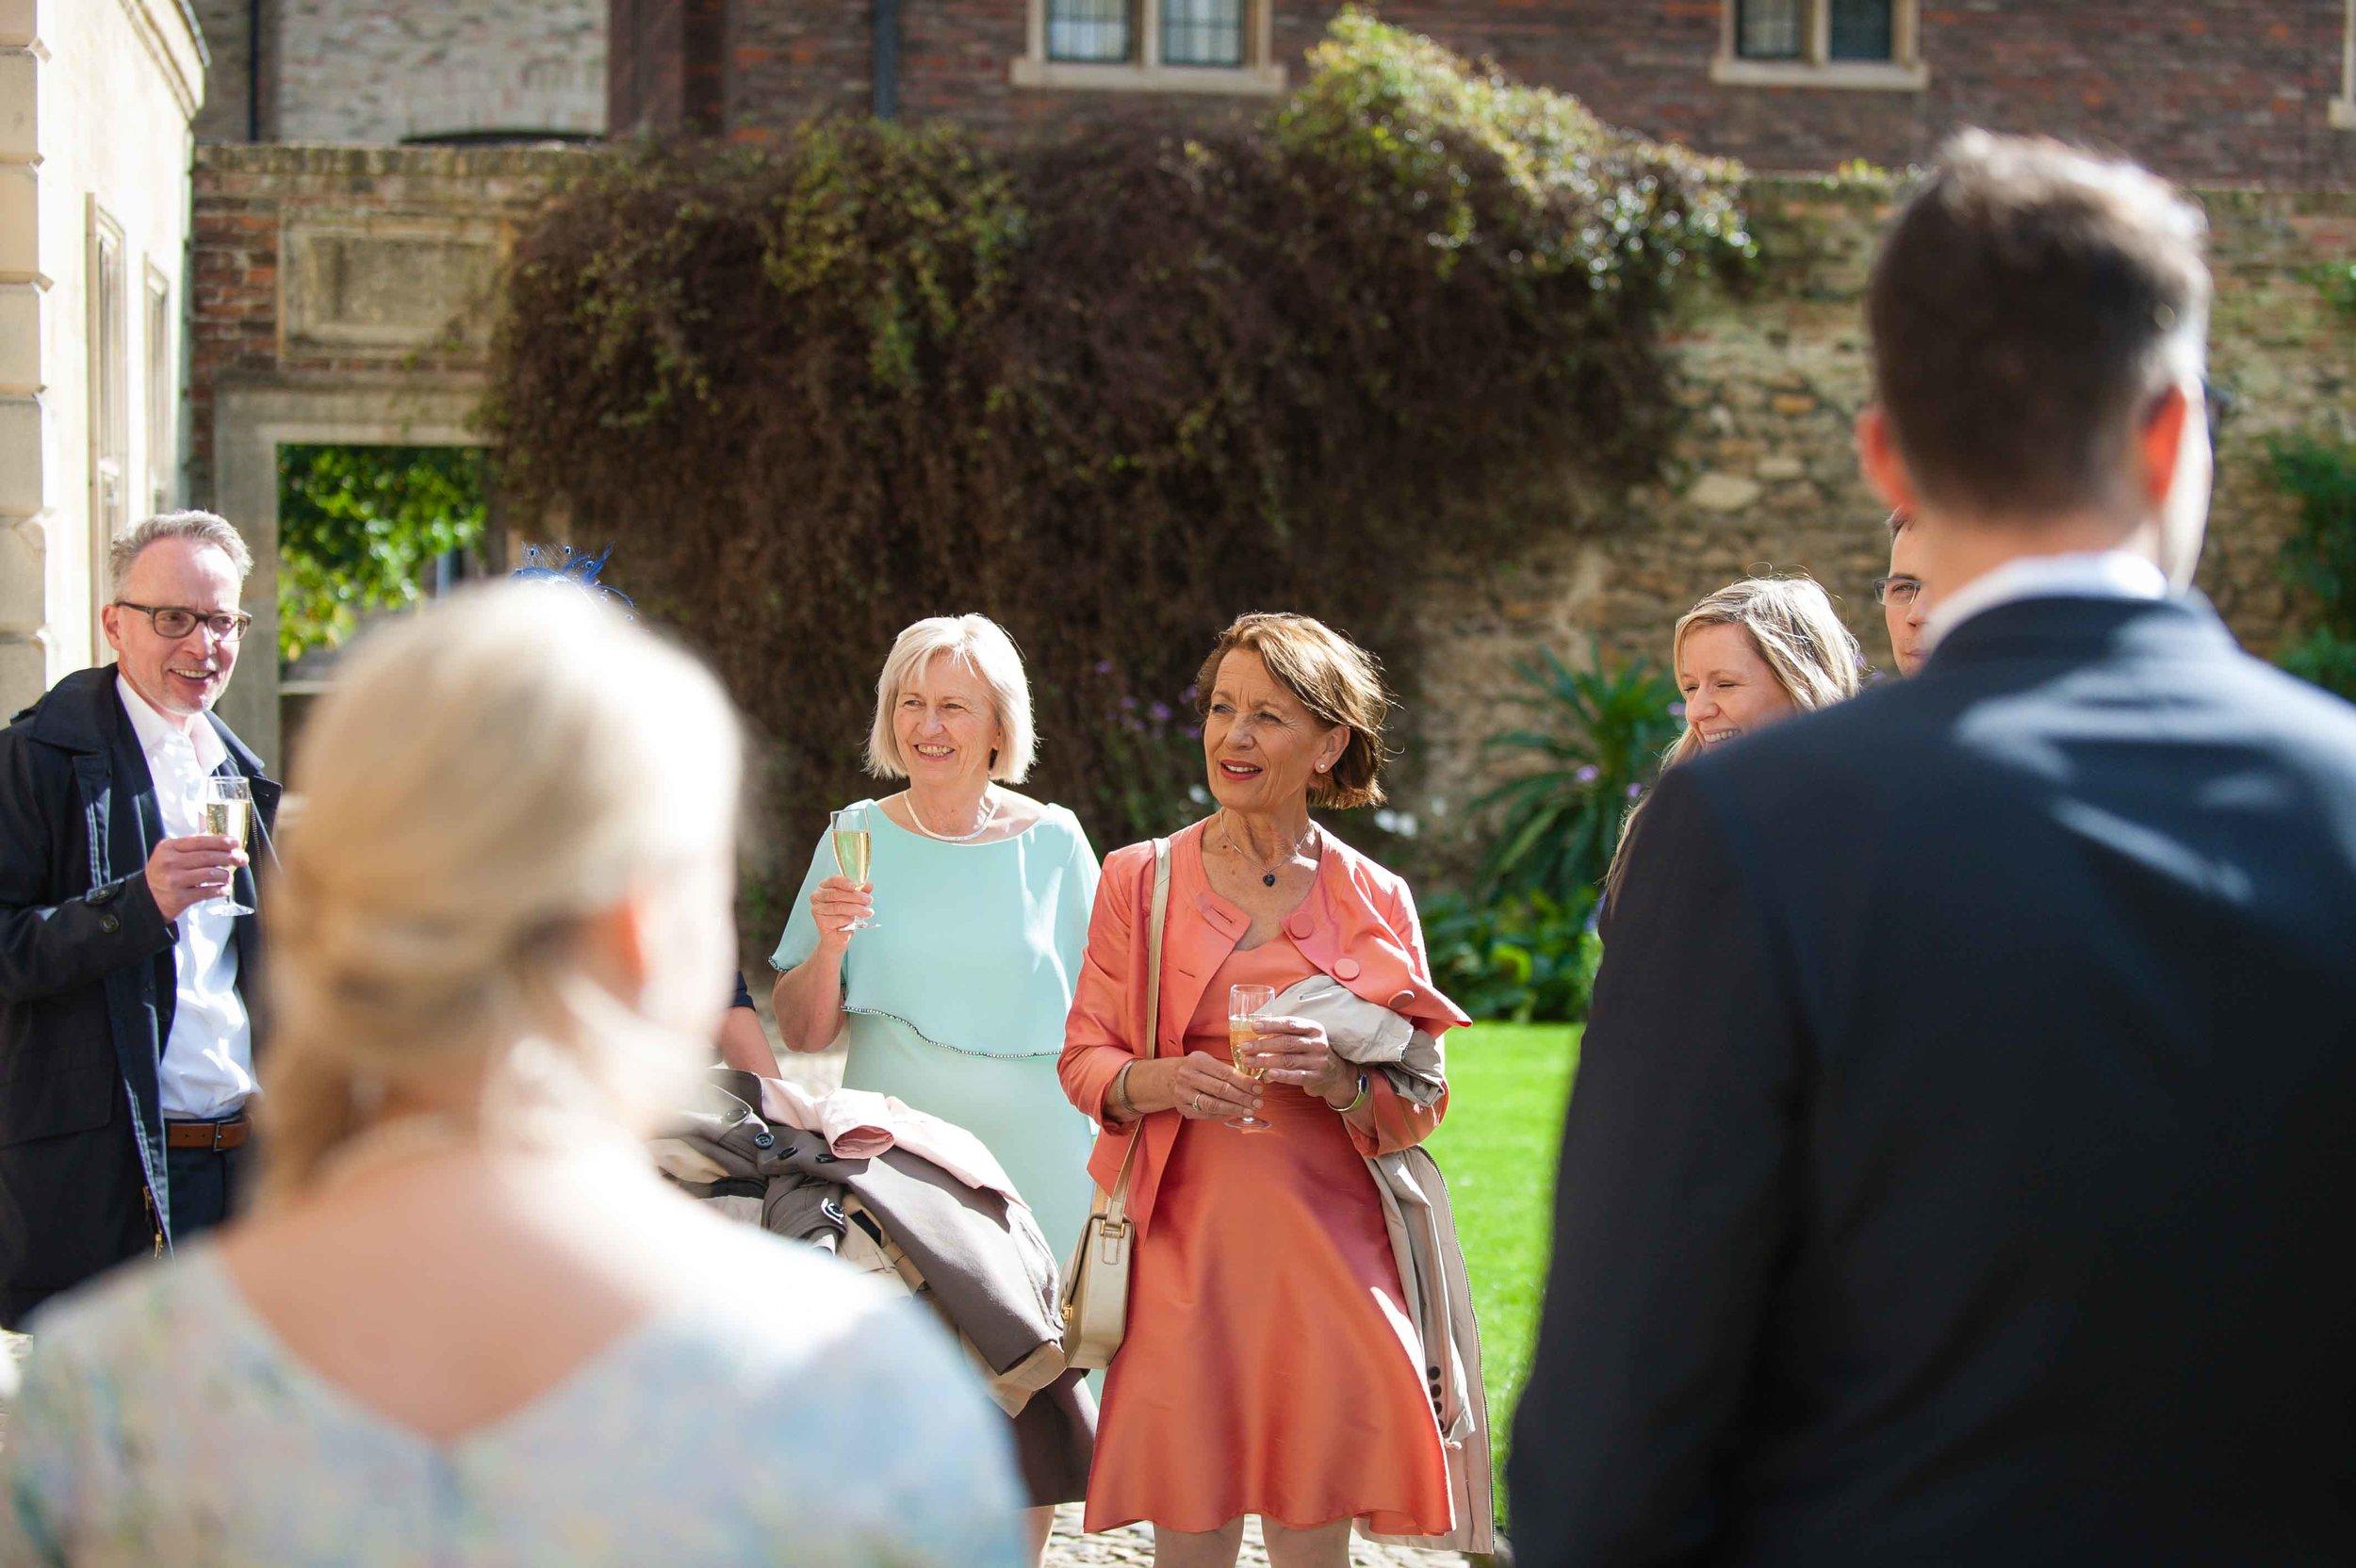 Adrian_Nicole_Charnwood_Weddings_Queens_College_Cambridge-1053.jpg